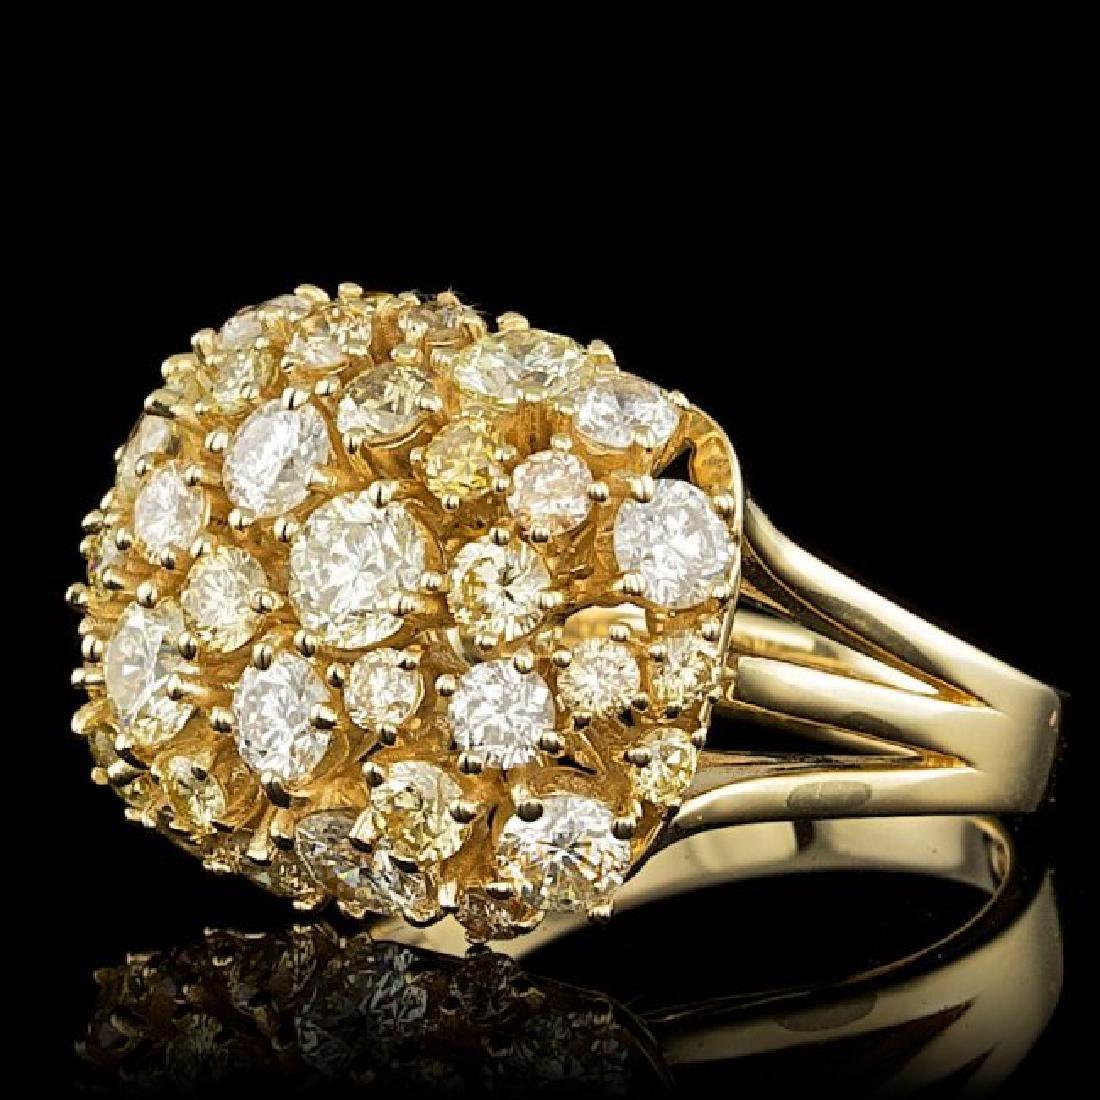 14k Yellow Gold 3.10ct Diamond Ring - 2